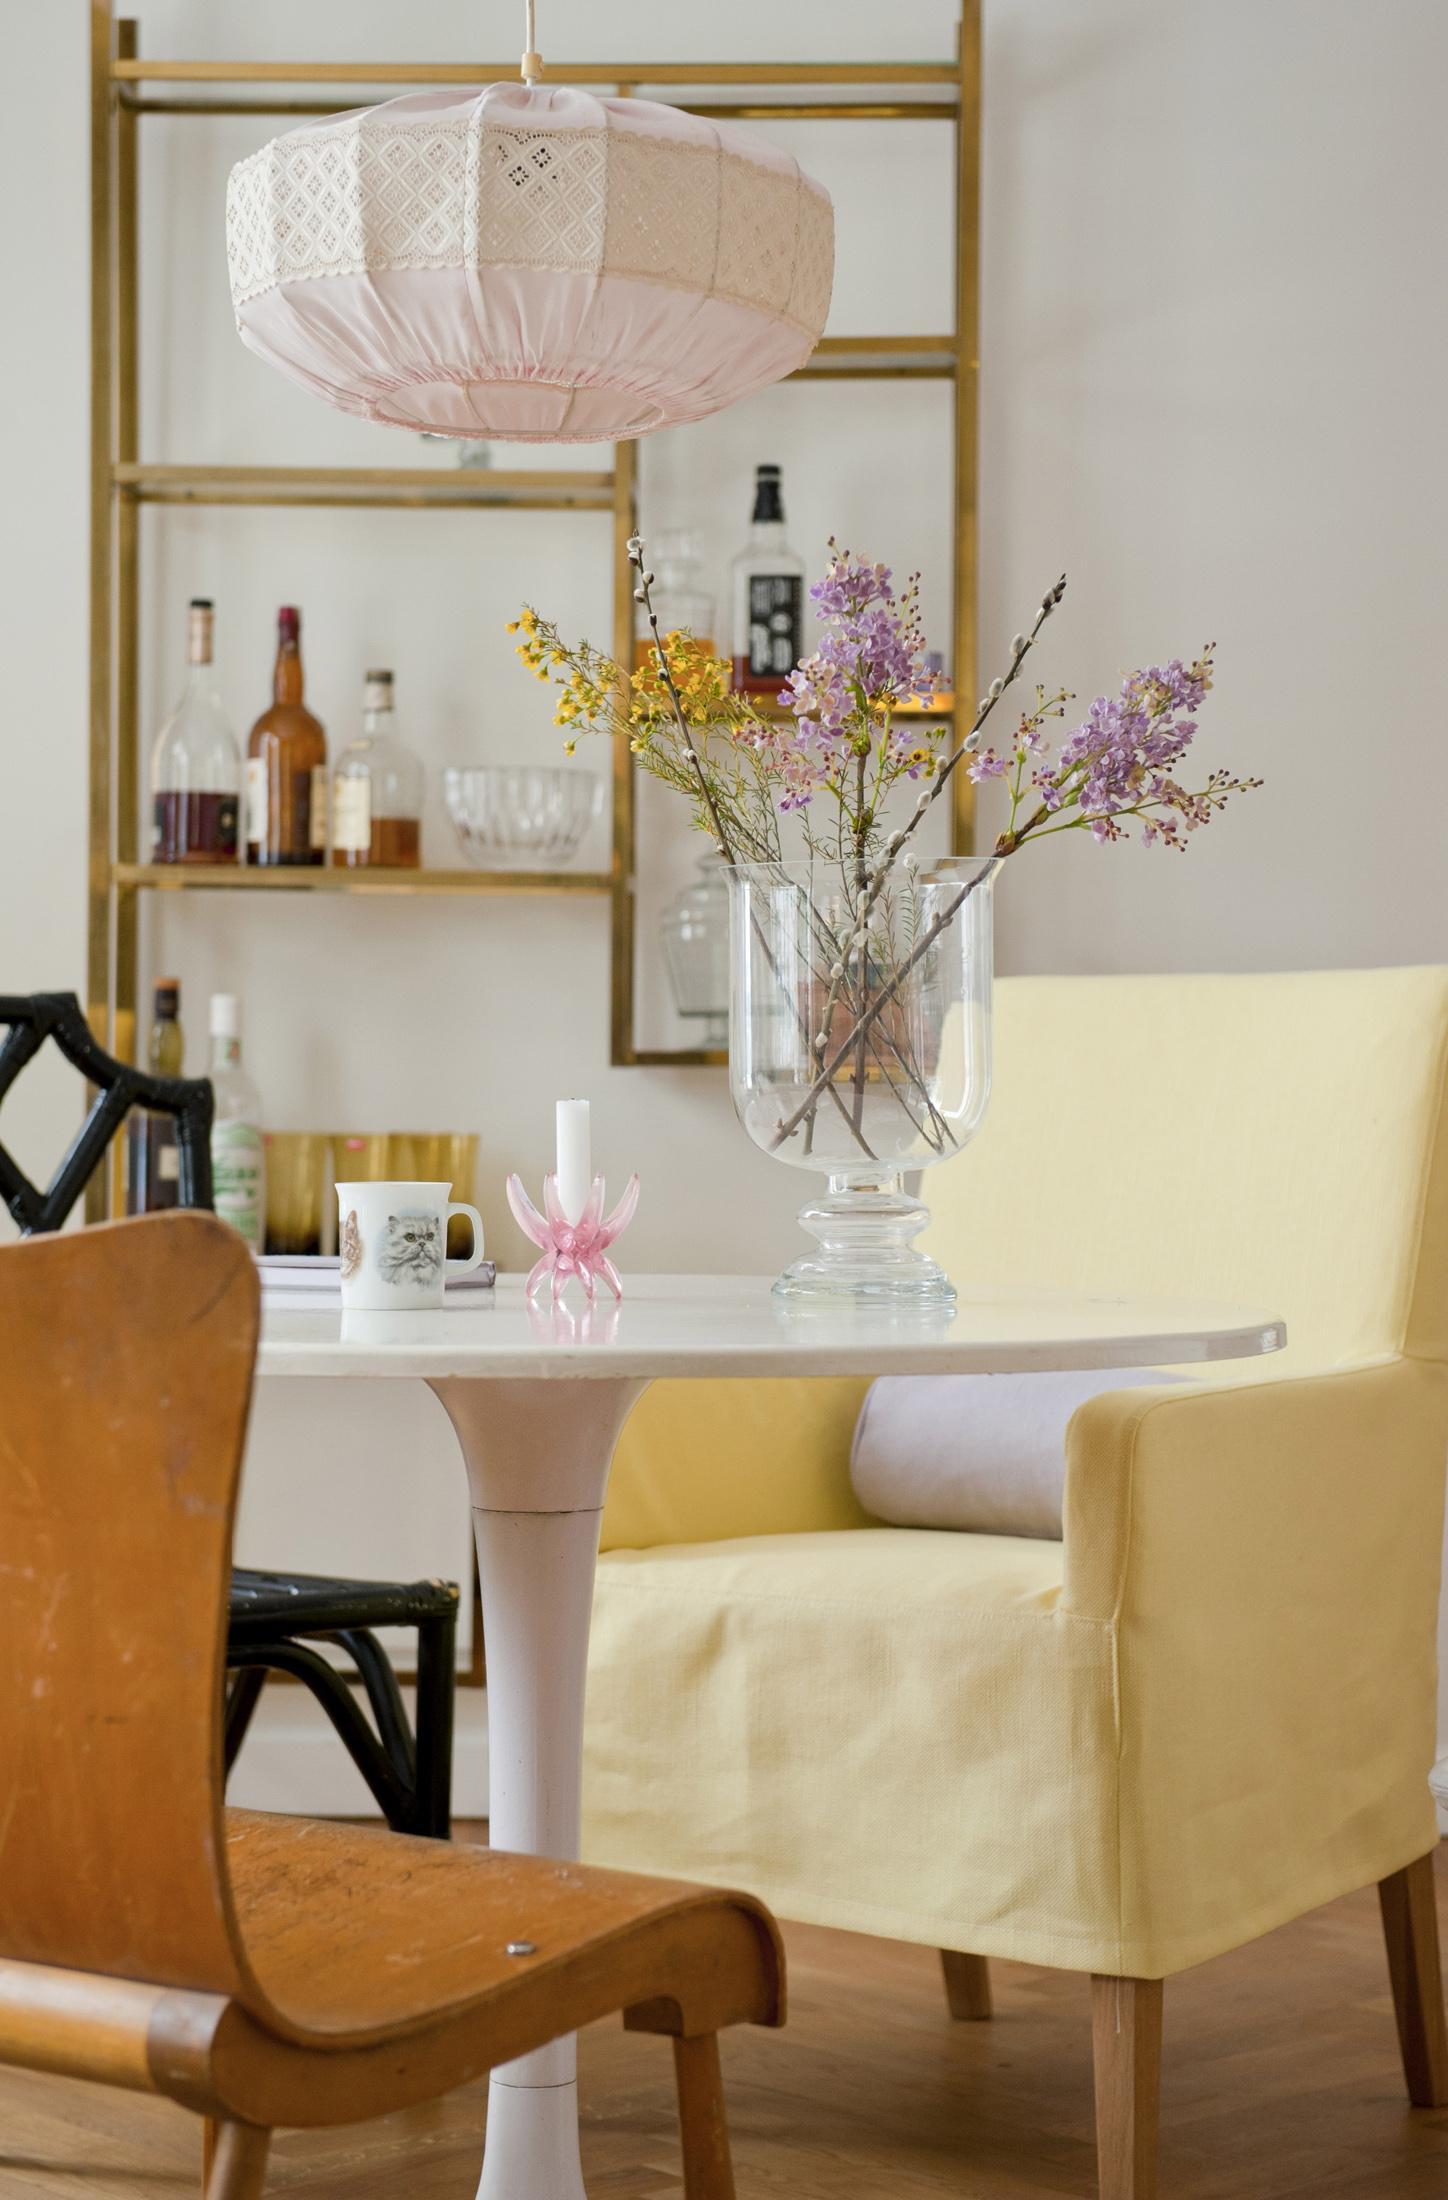 tischdeko blume bilder ideen couchstyle. Black Bedroom Furniture Sets. Home Design Ideas